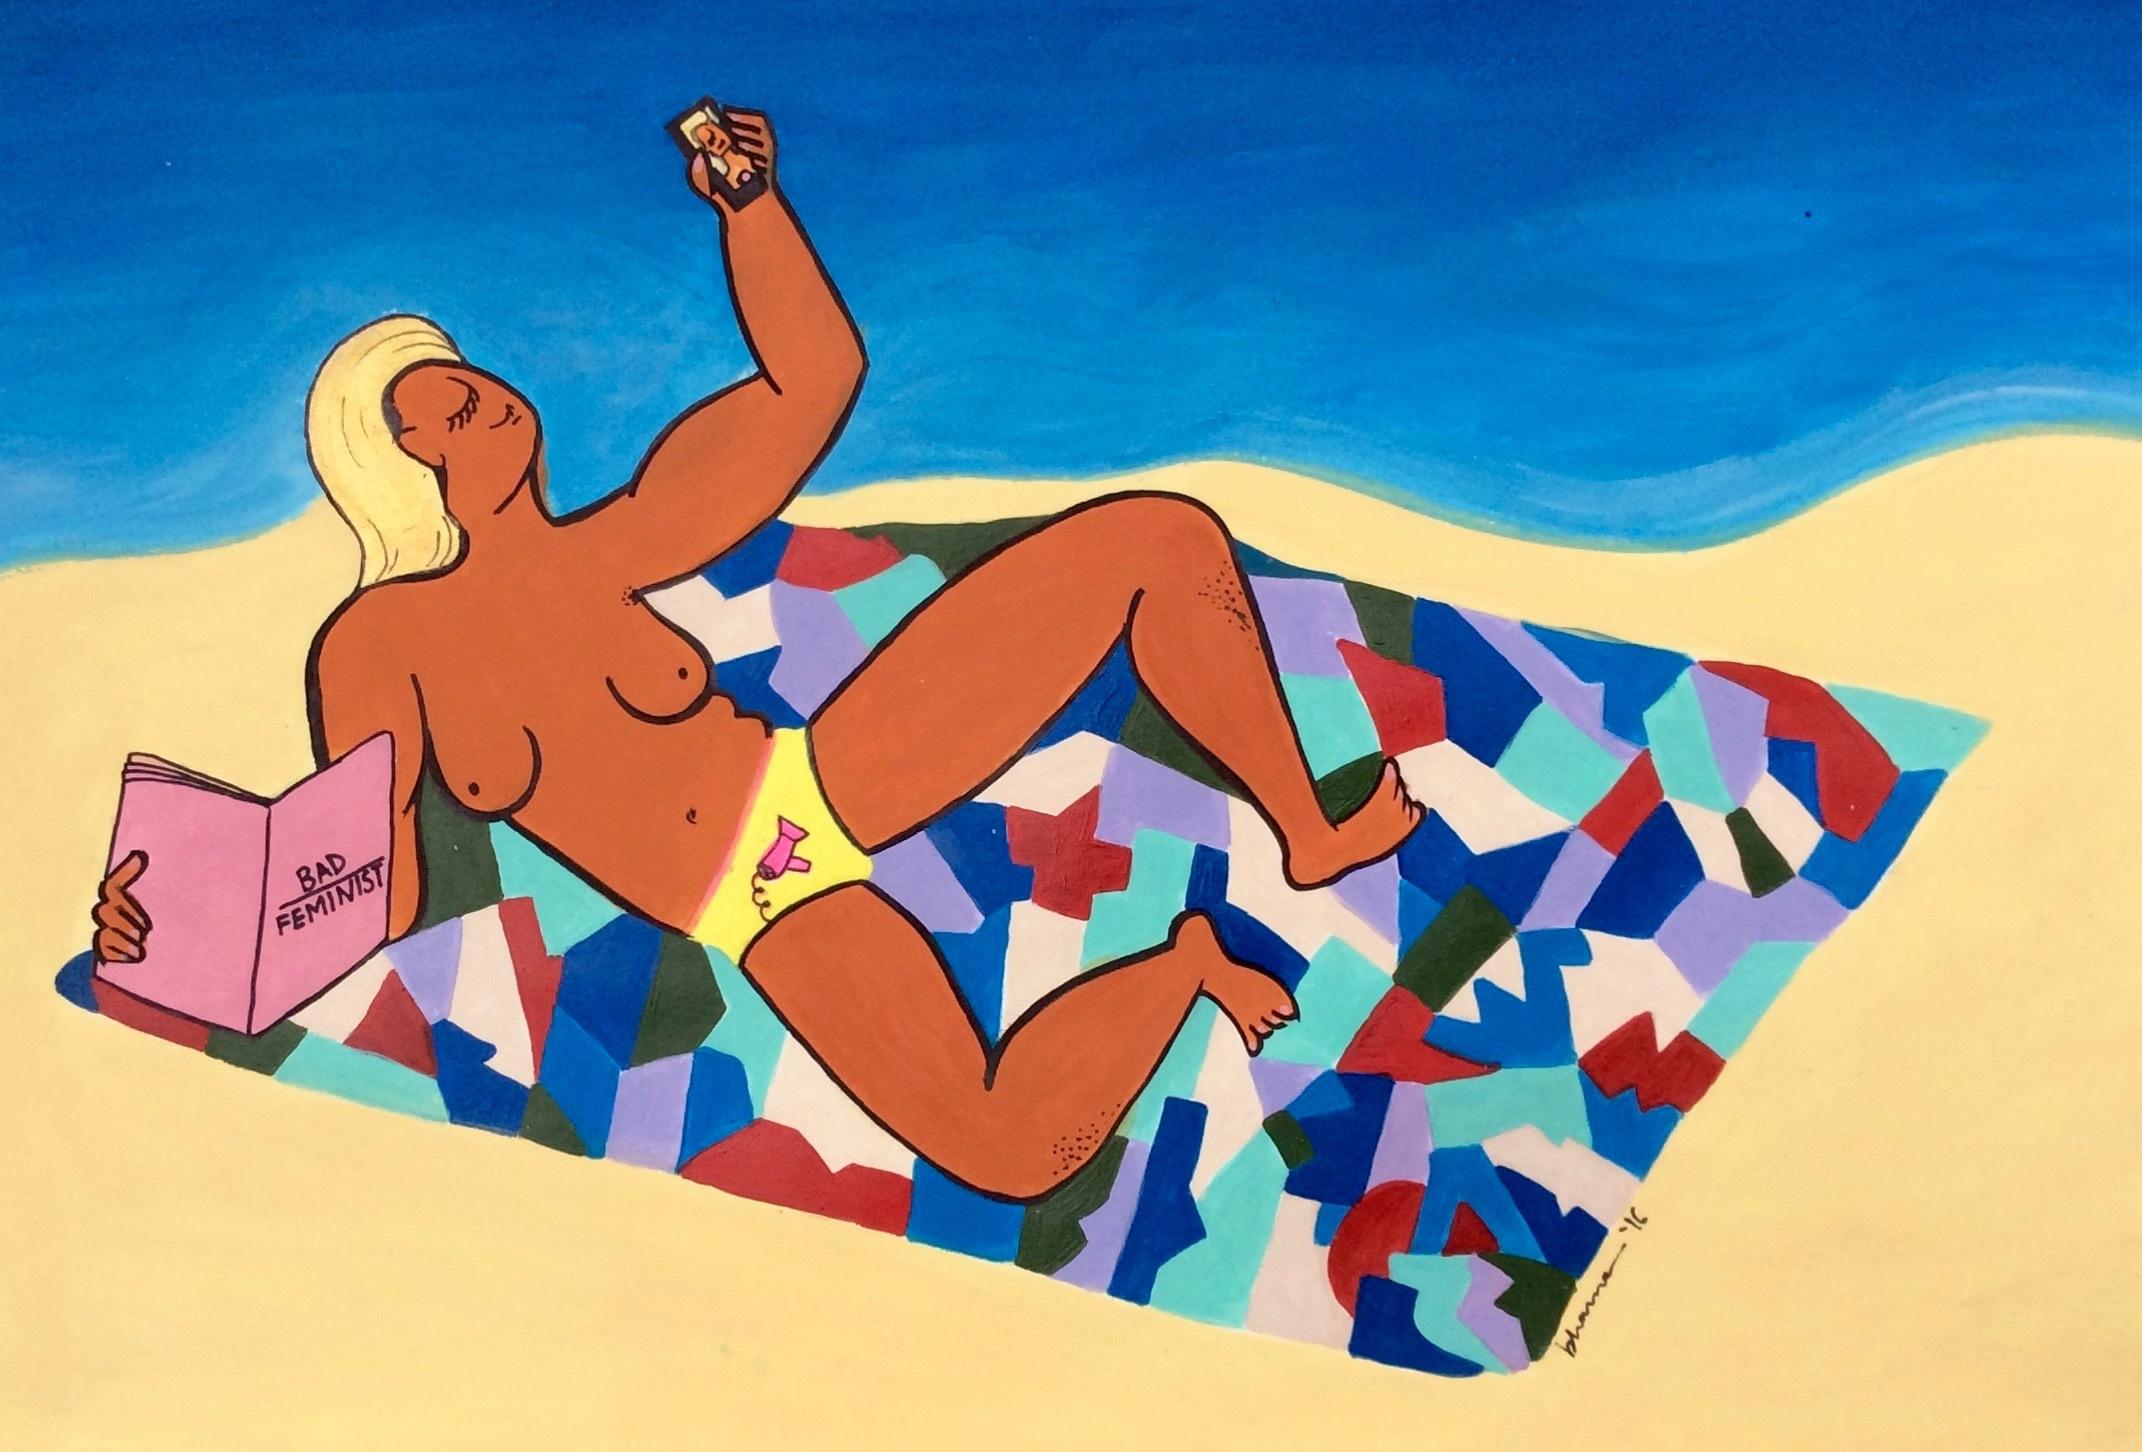 Bhavna Shivayogimath: The Topless Liberation Front